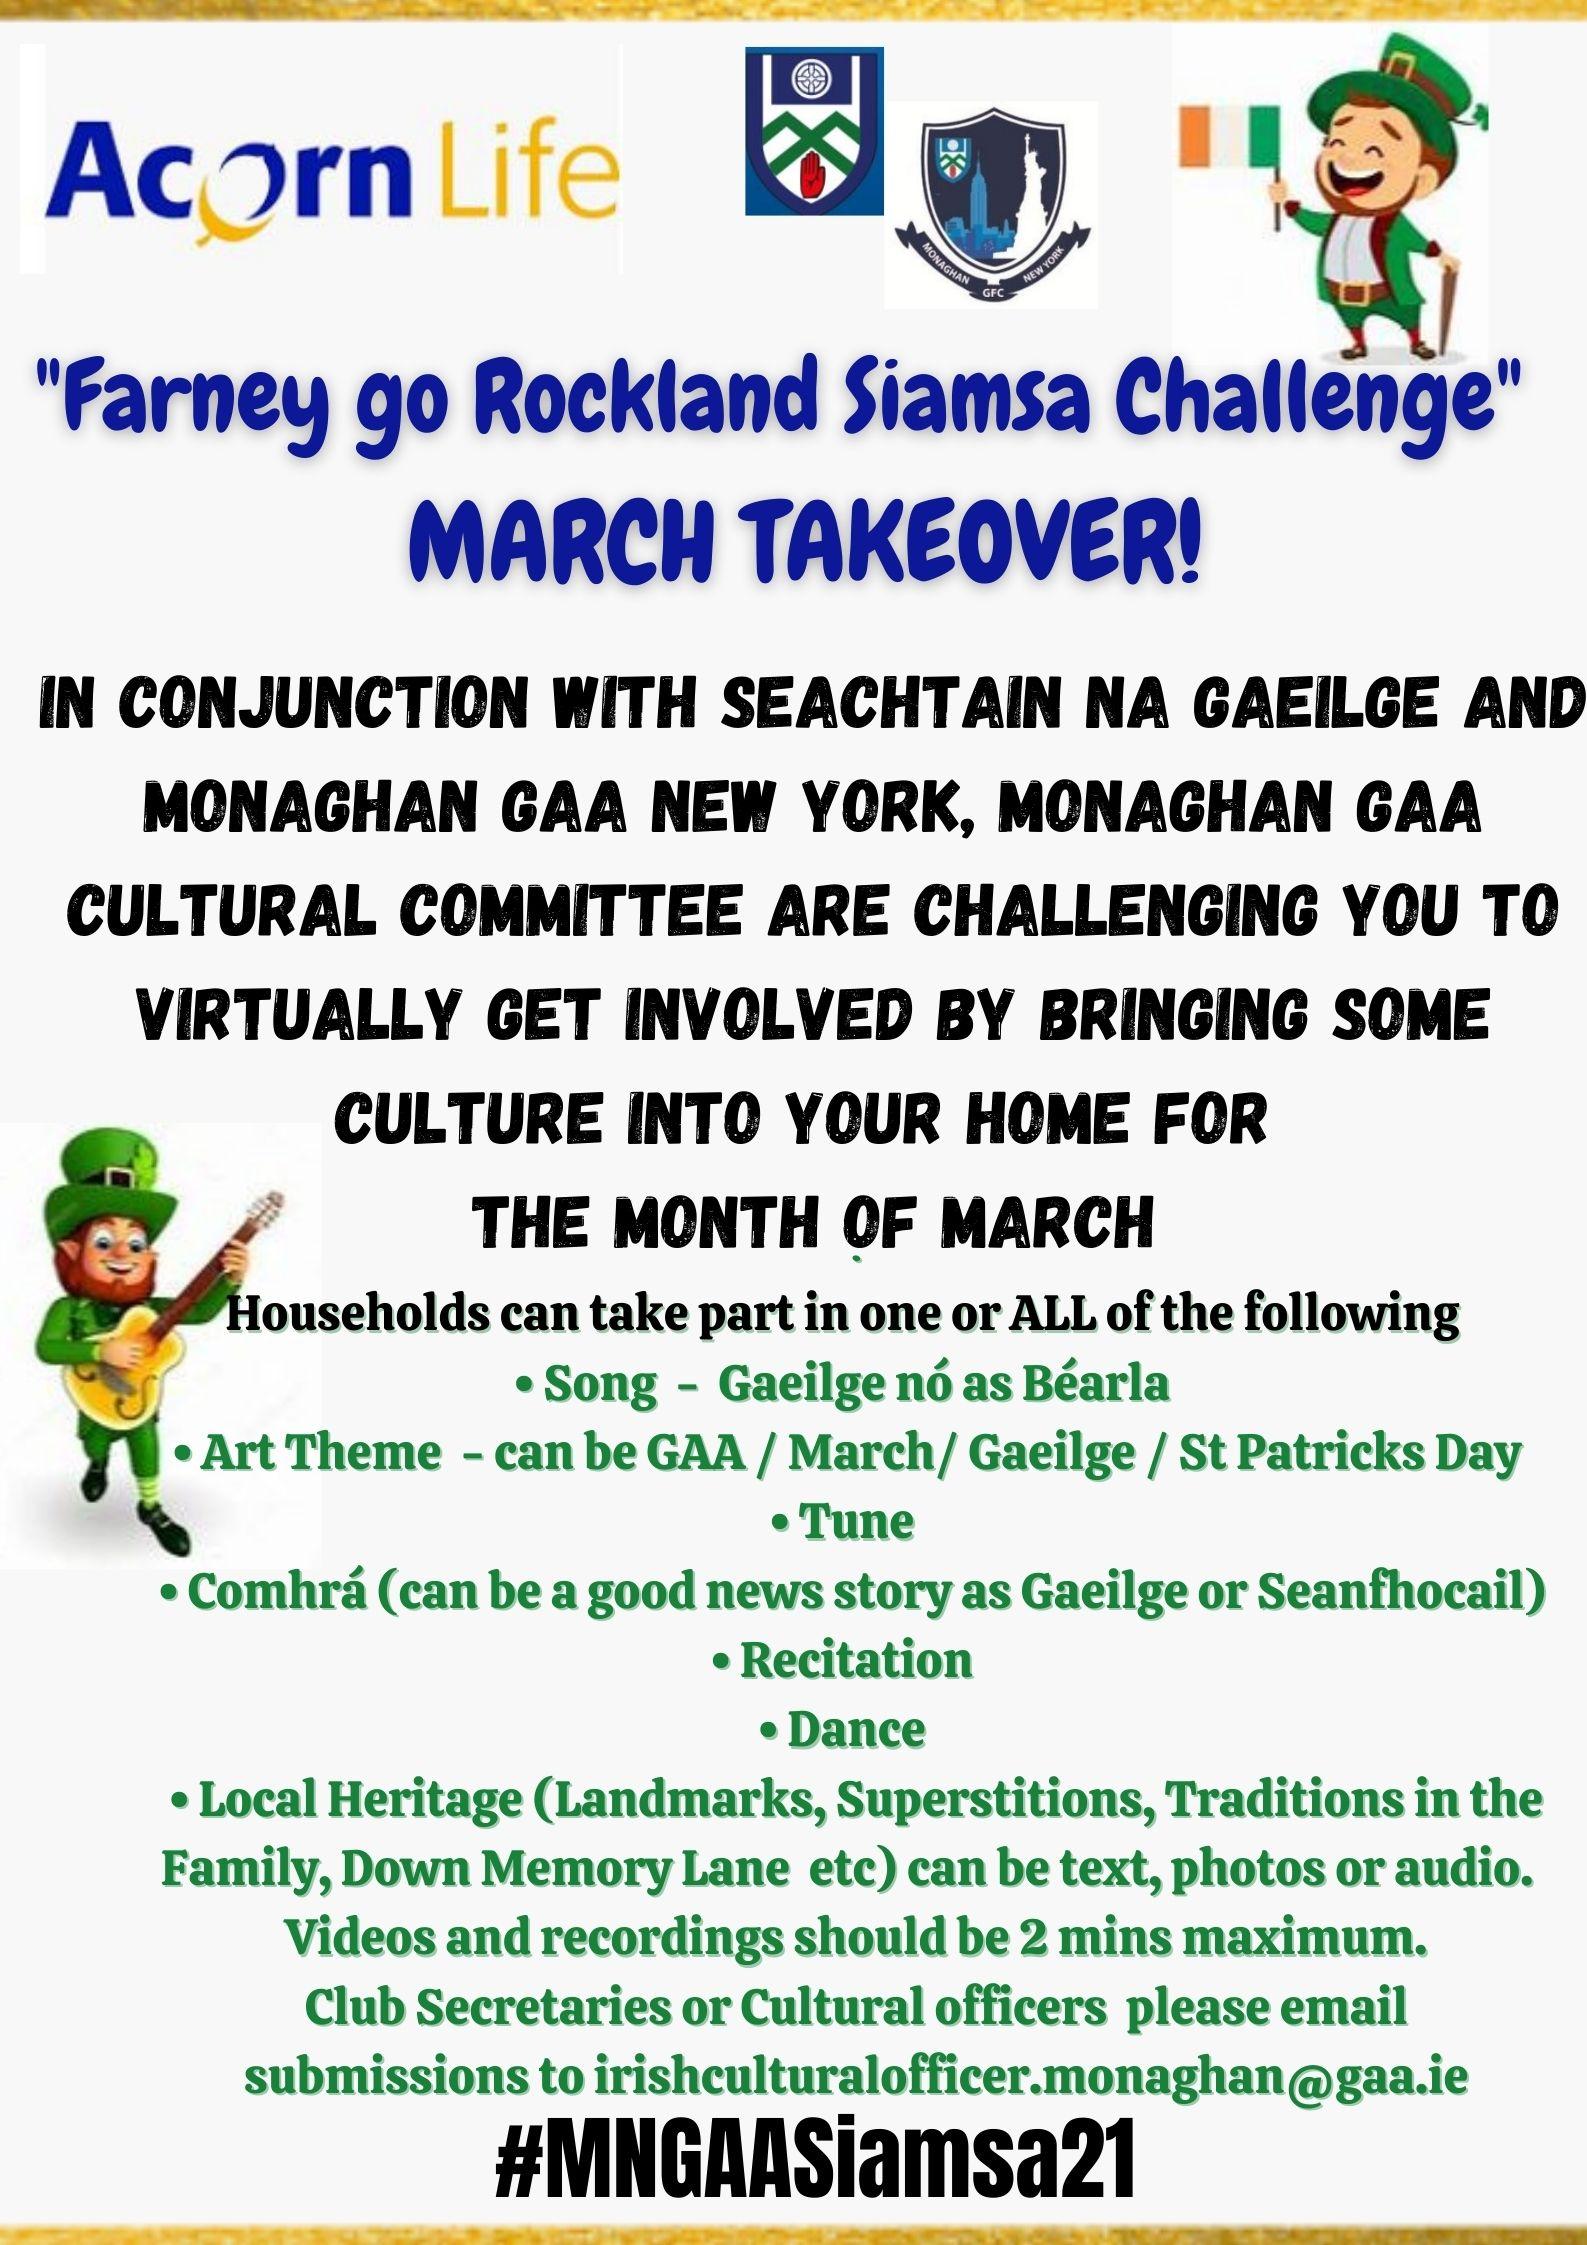 Acorn Life 'Farney go Rockland Siamsa Challenge 2021'